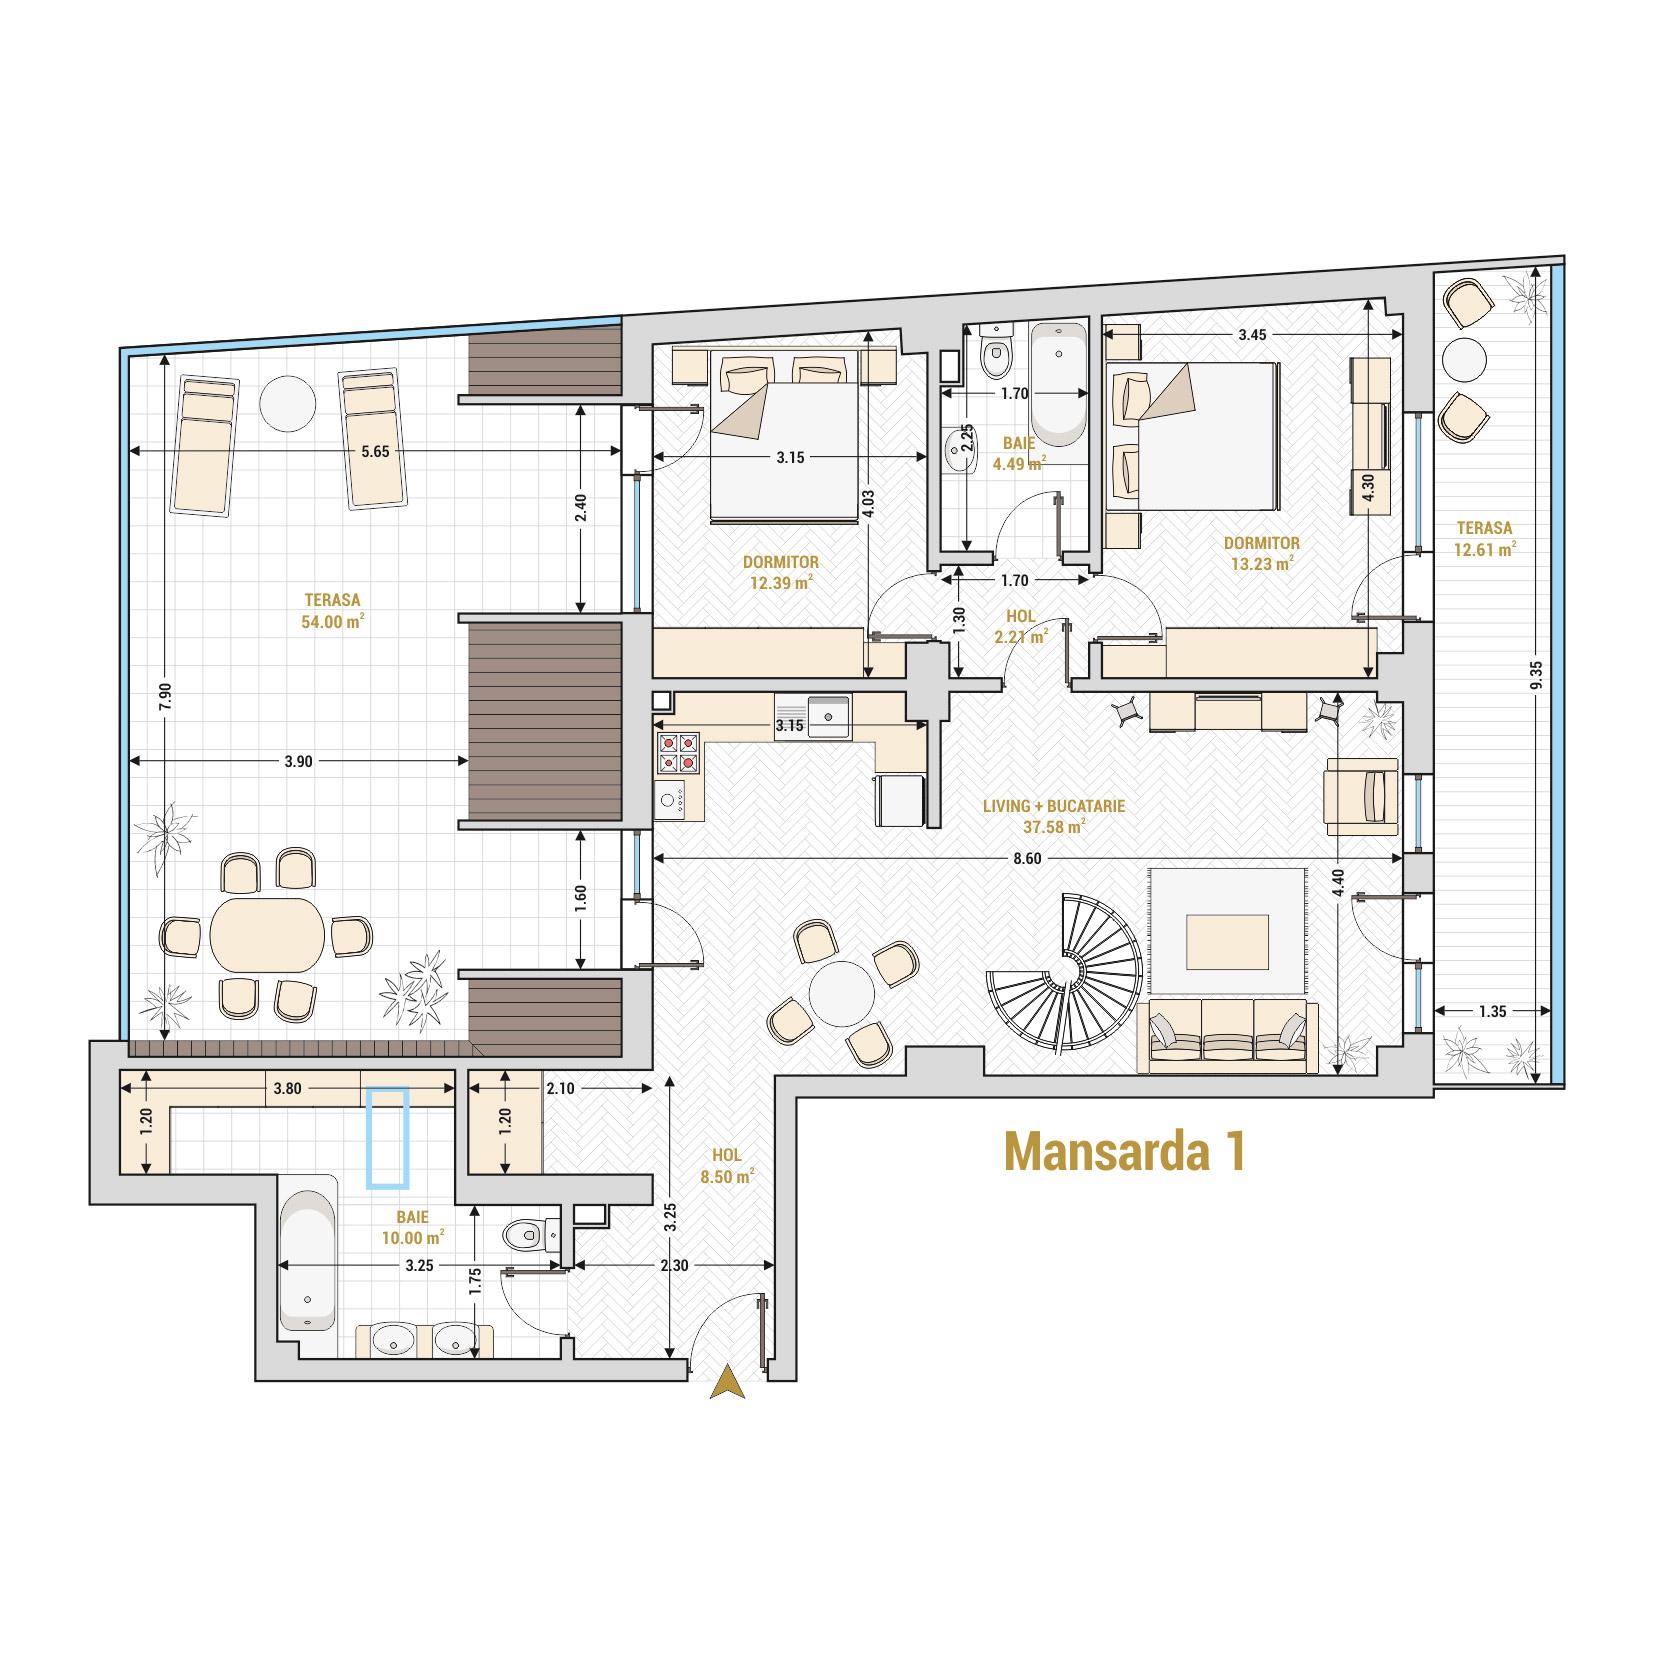 Duplex 4 camere de vanzare Bucuresti - Catedral Residence - Marriott, Piata Unirii, 13 Septembrie, Izvor - Tip 2 - T2 - A